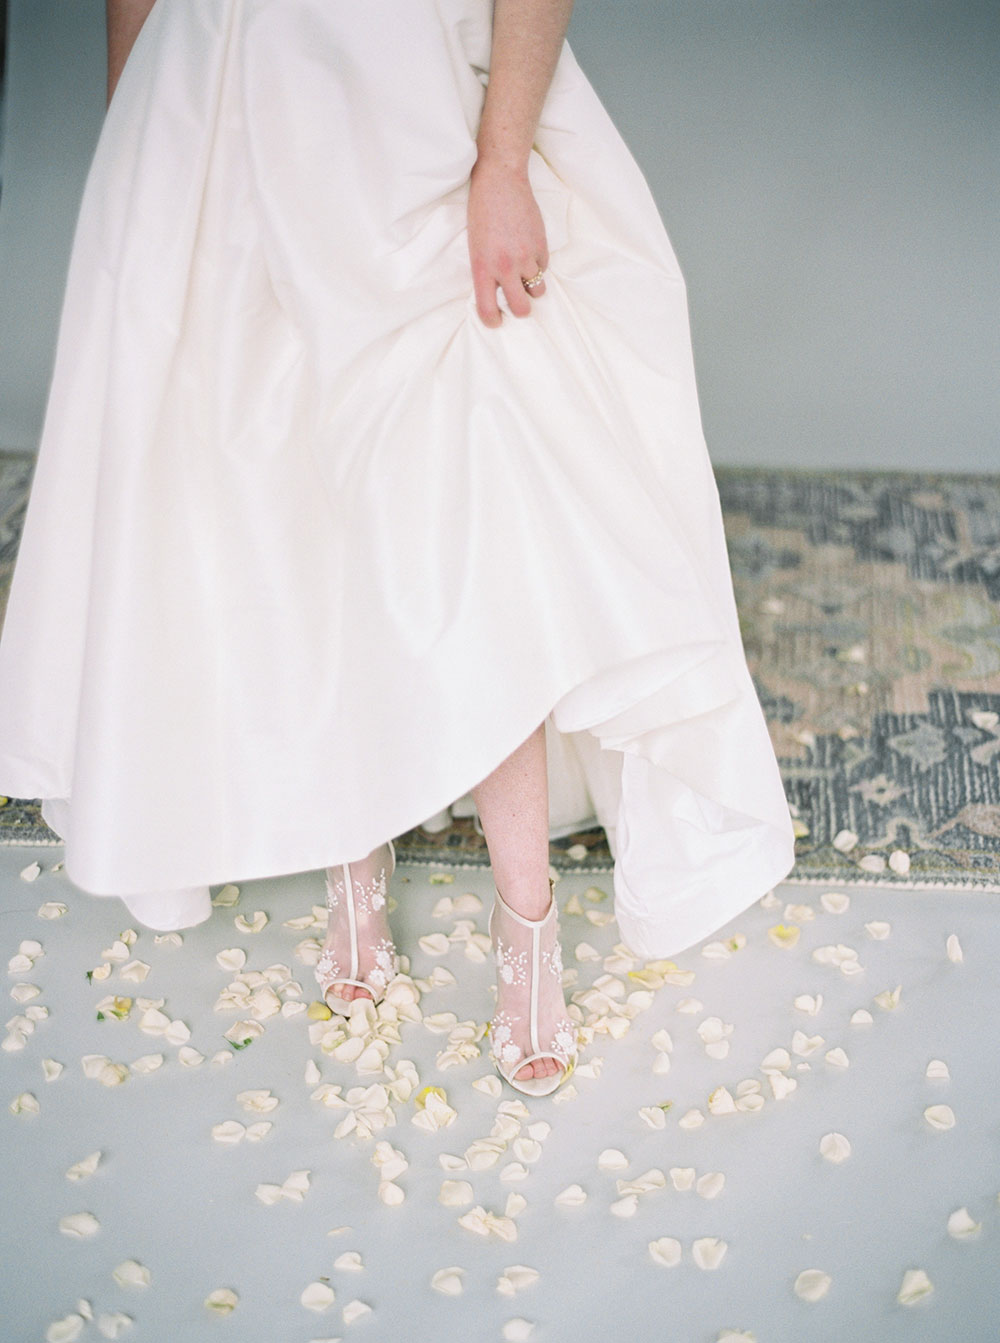 mStarr-your-dream-bridal-117.jpg